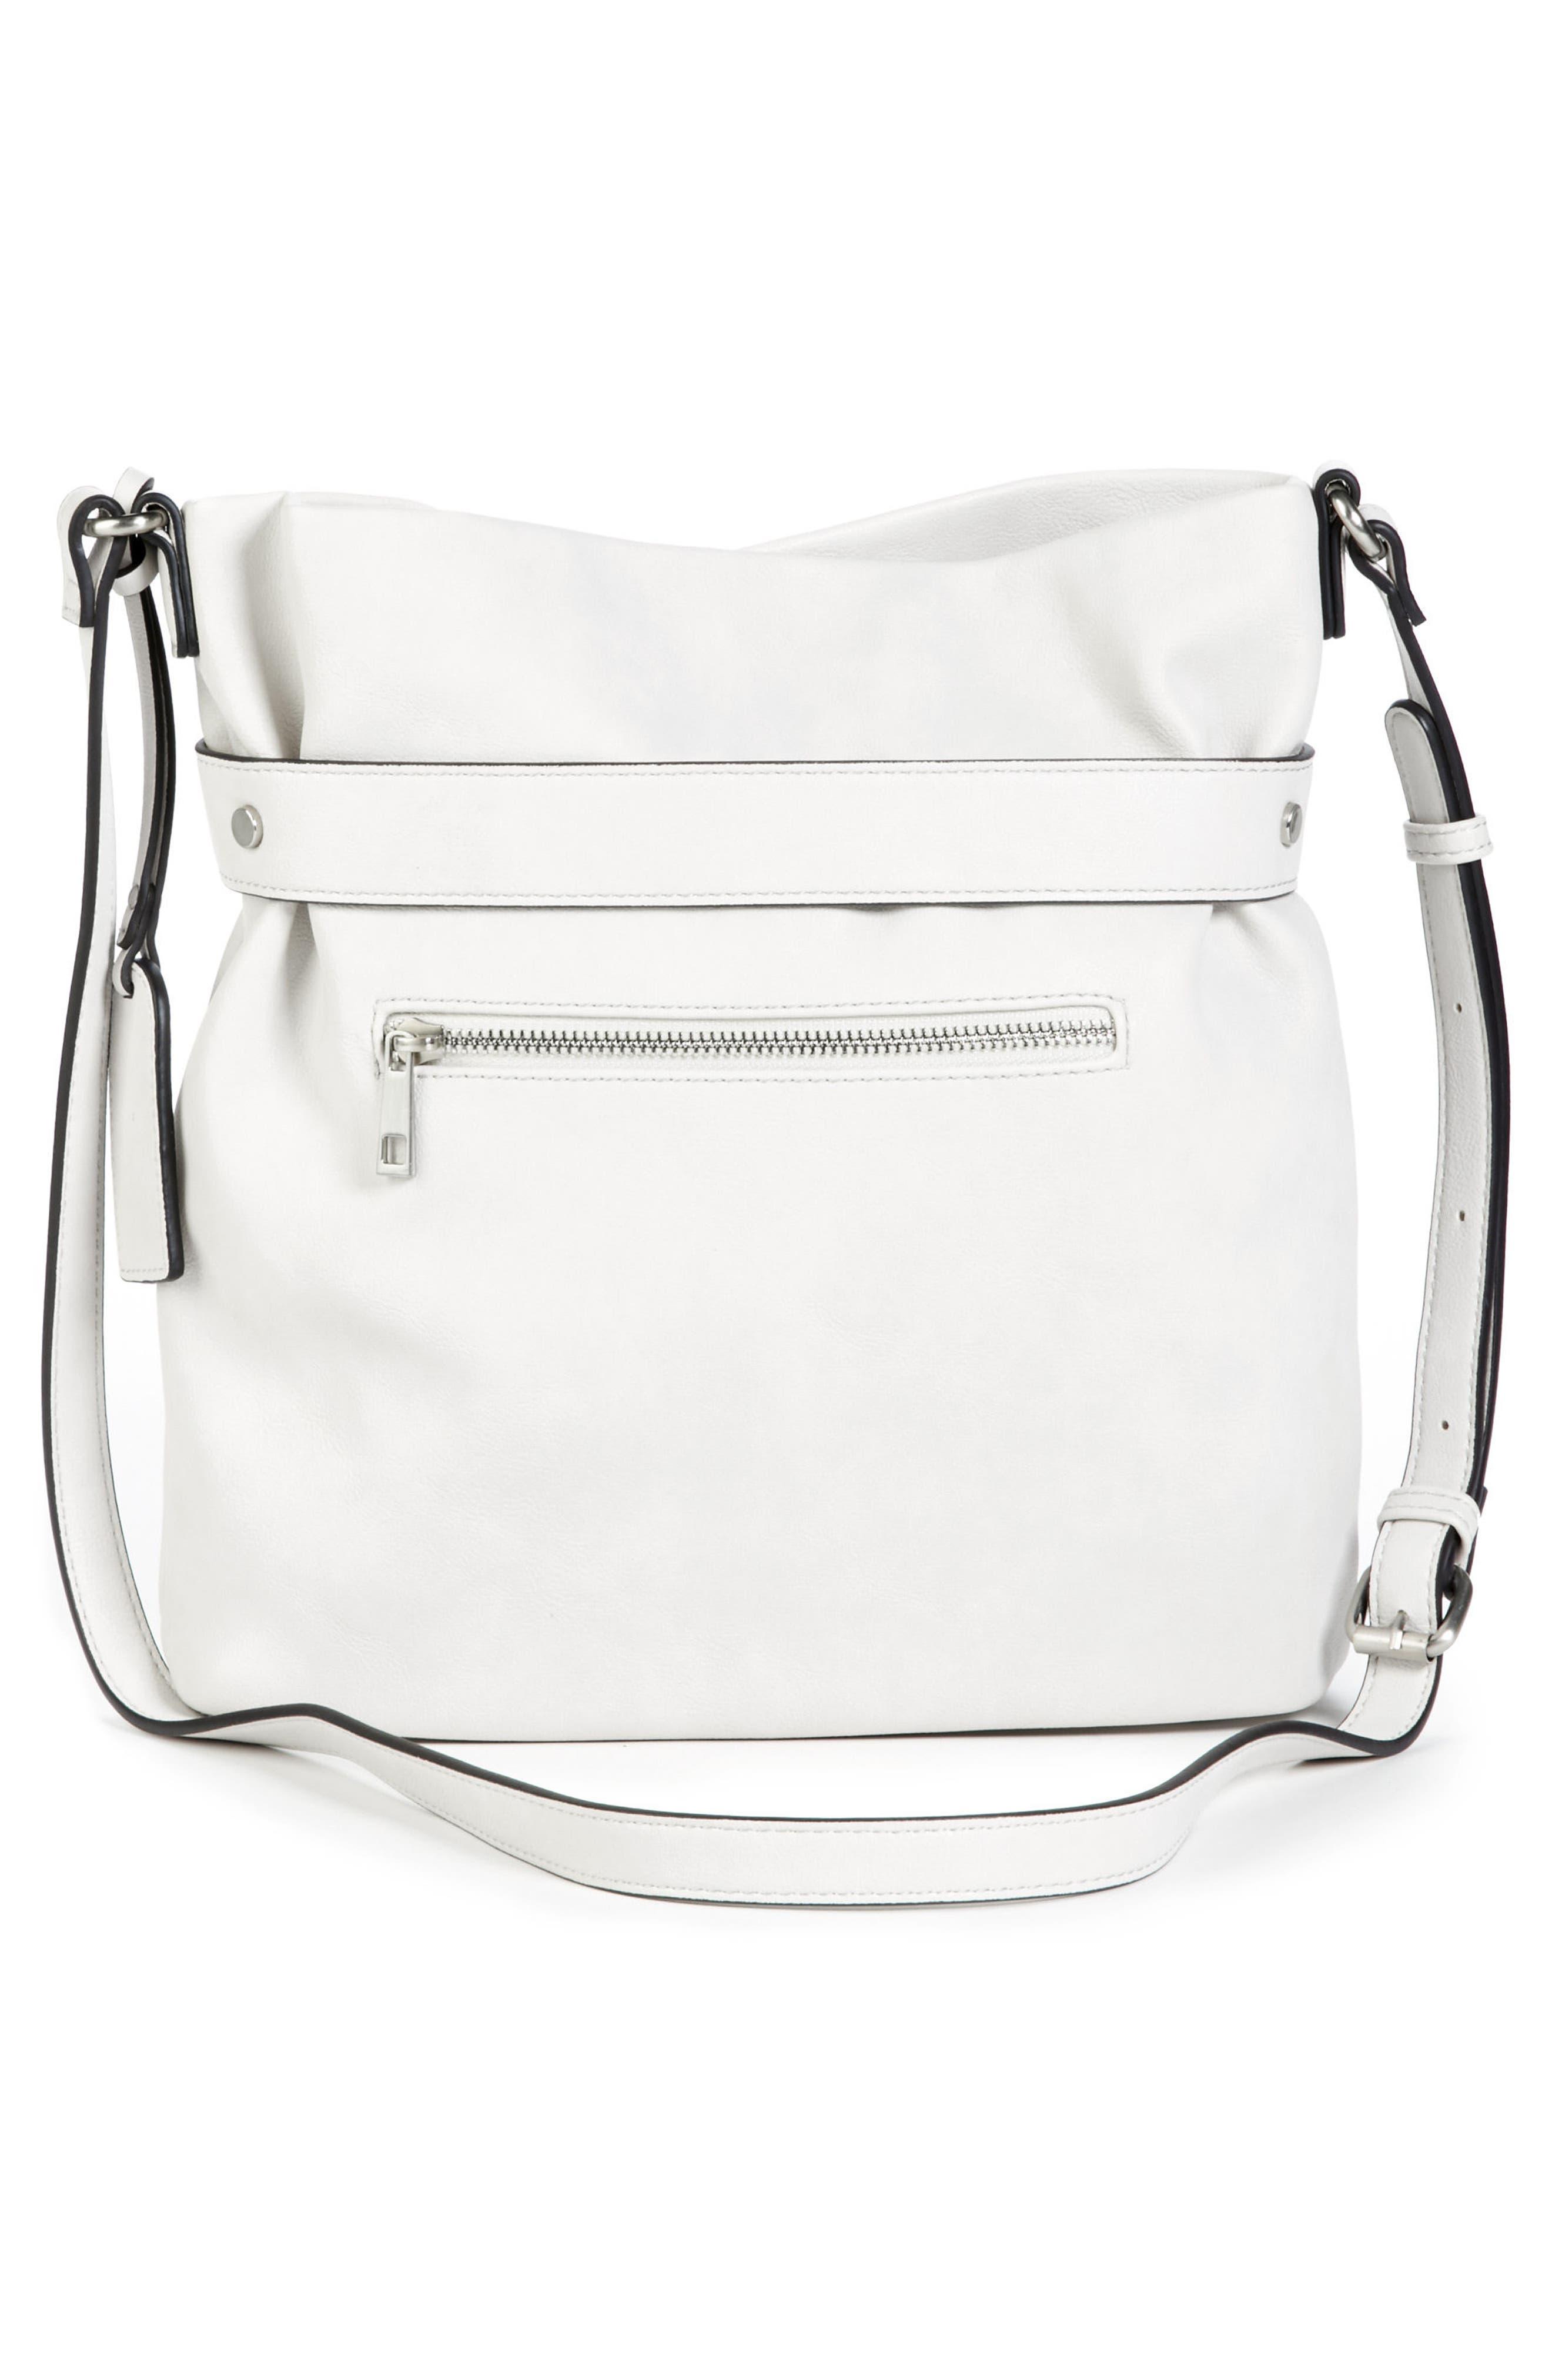 Karon Faux Leather Shoulder Bag,                             Alternate thumbnail 2, color,                             104